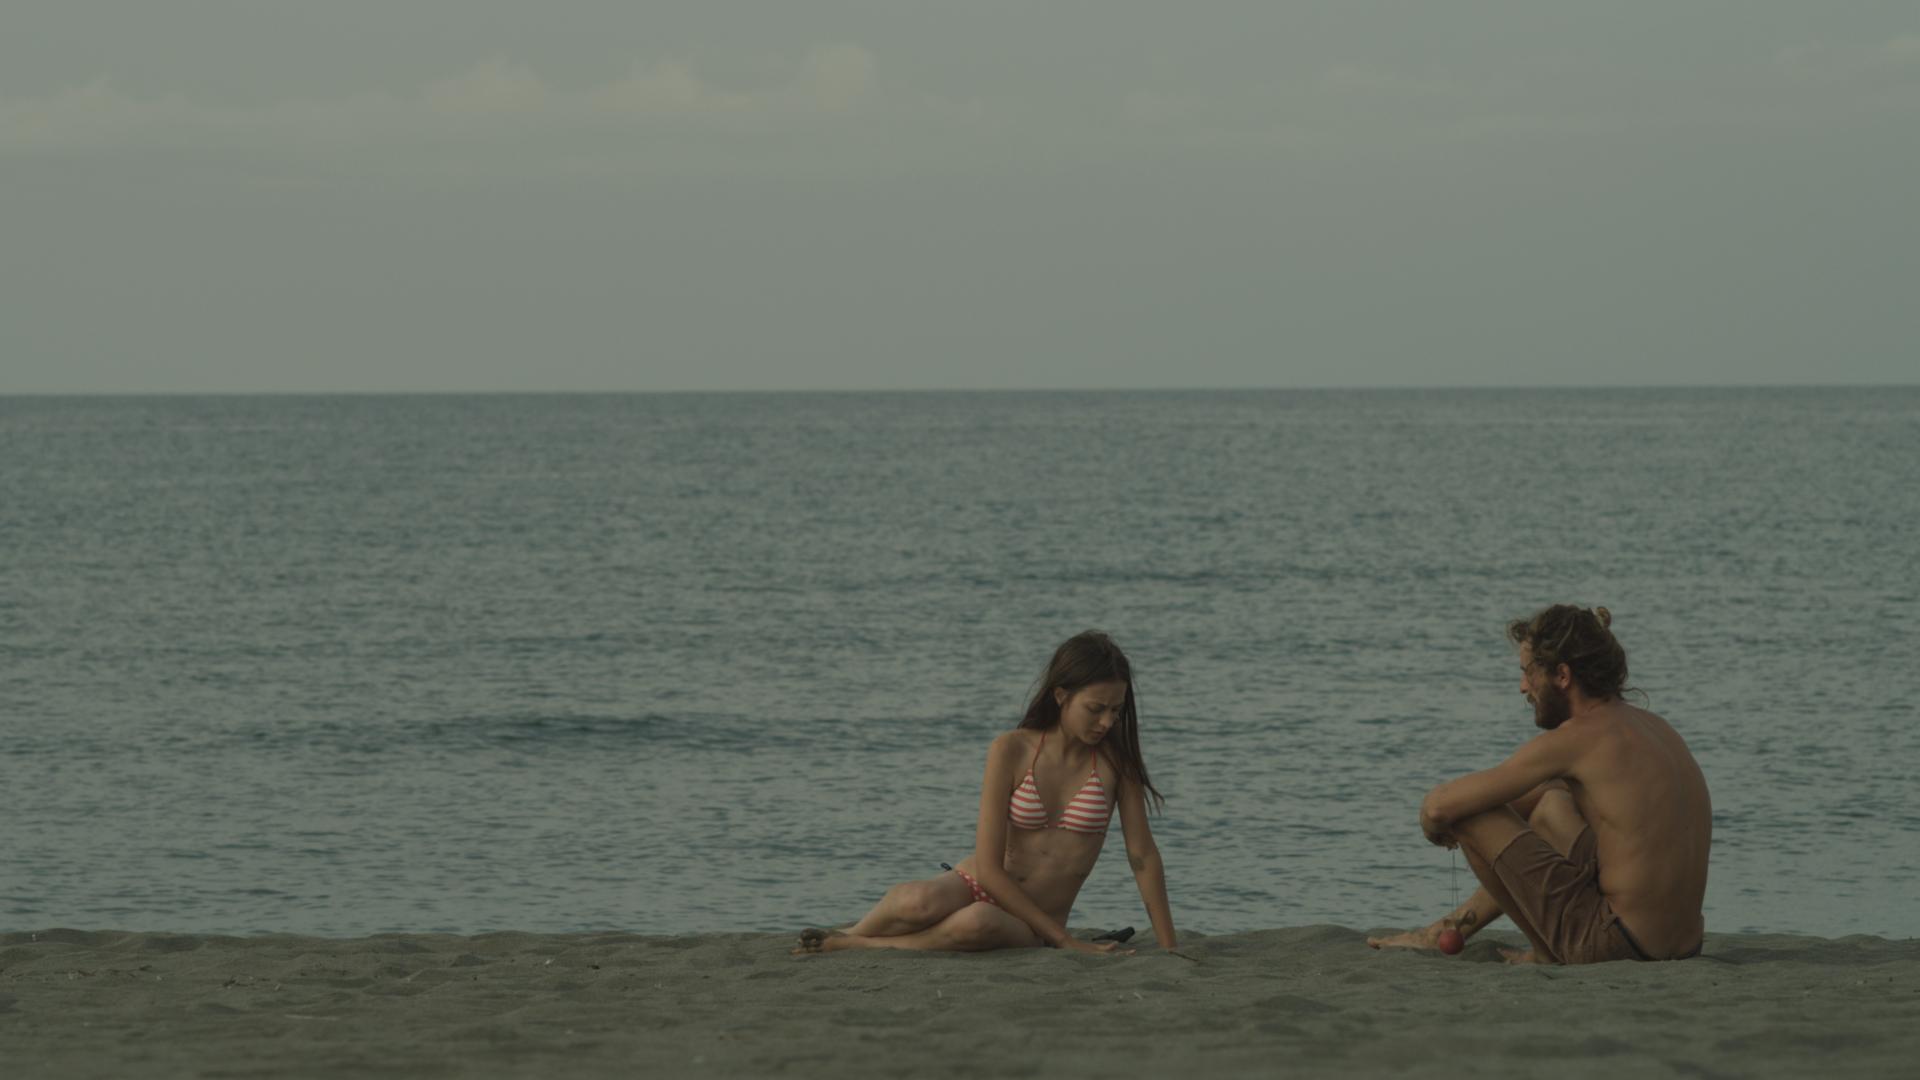 VETAR – između piksela: Izložba fotografija povodom premijere filma